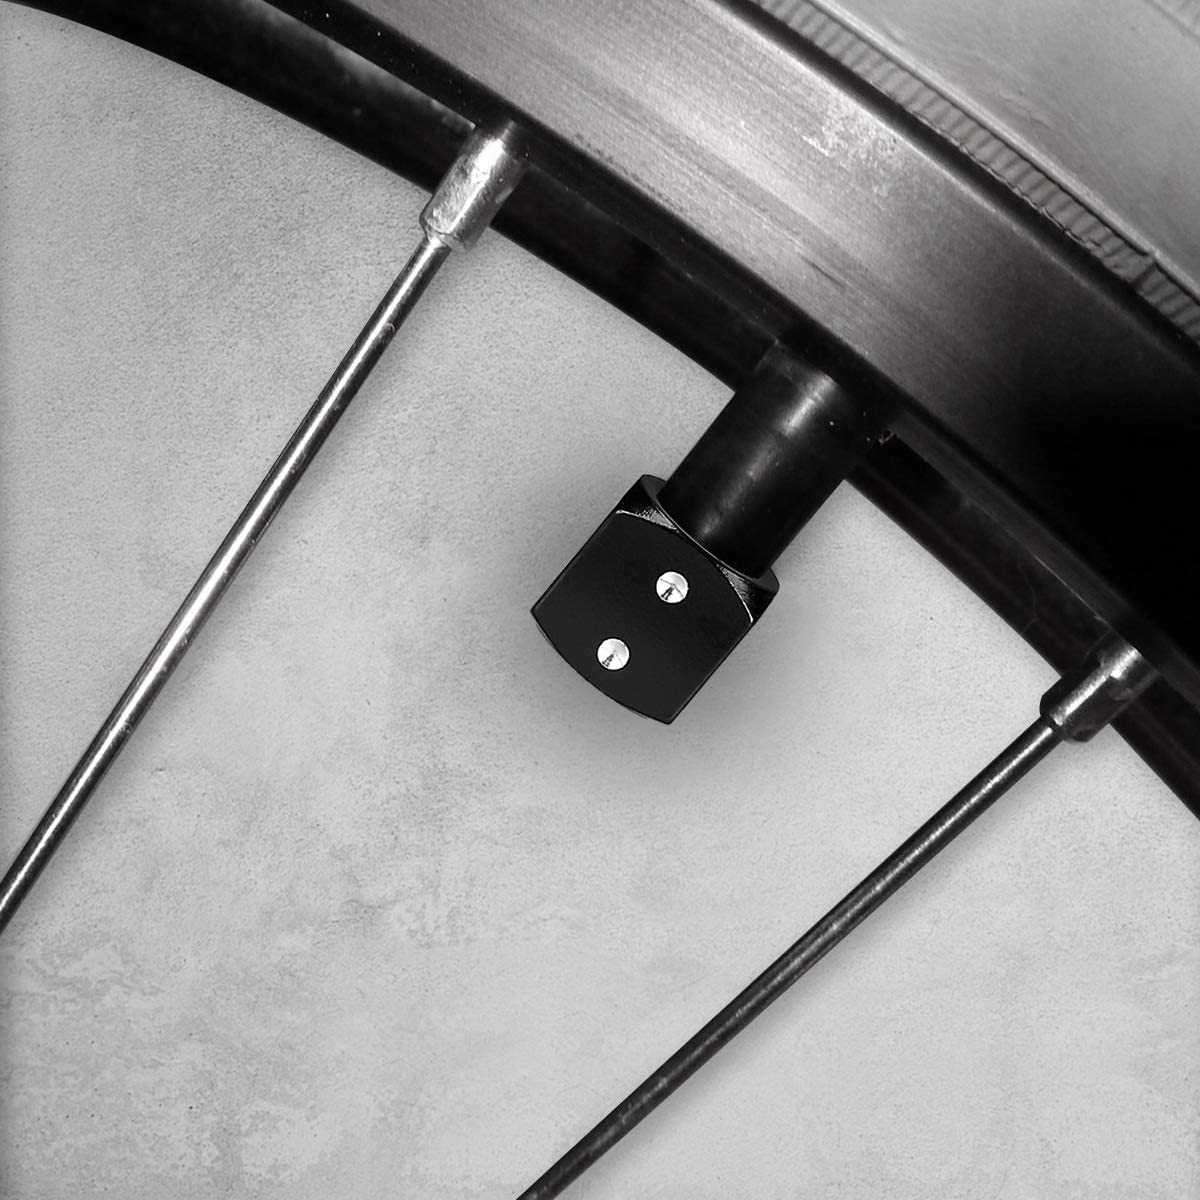 Bike Set of 5 Tire Stem Car Wheel Dustproof Cap Metal Tire Valve Dust Caps for Car kwmobile 5X Valve Cap Motorcycle